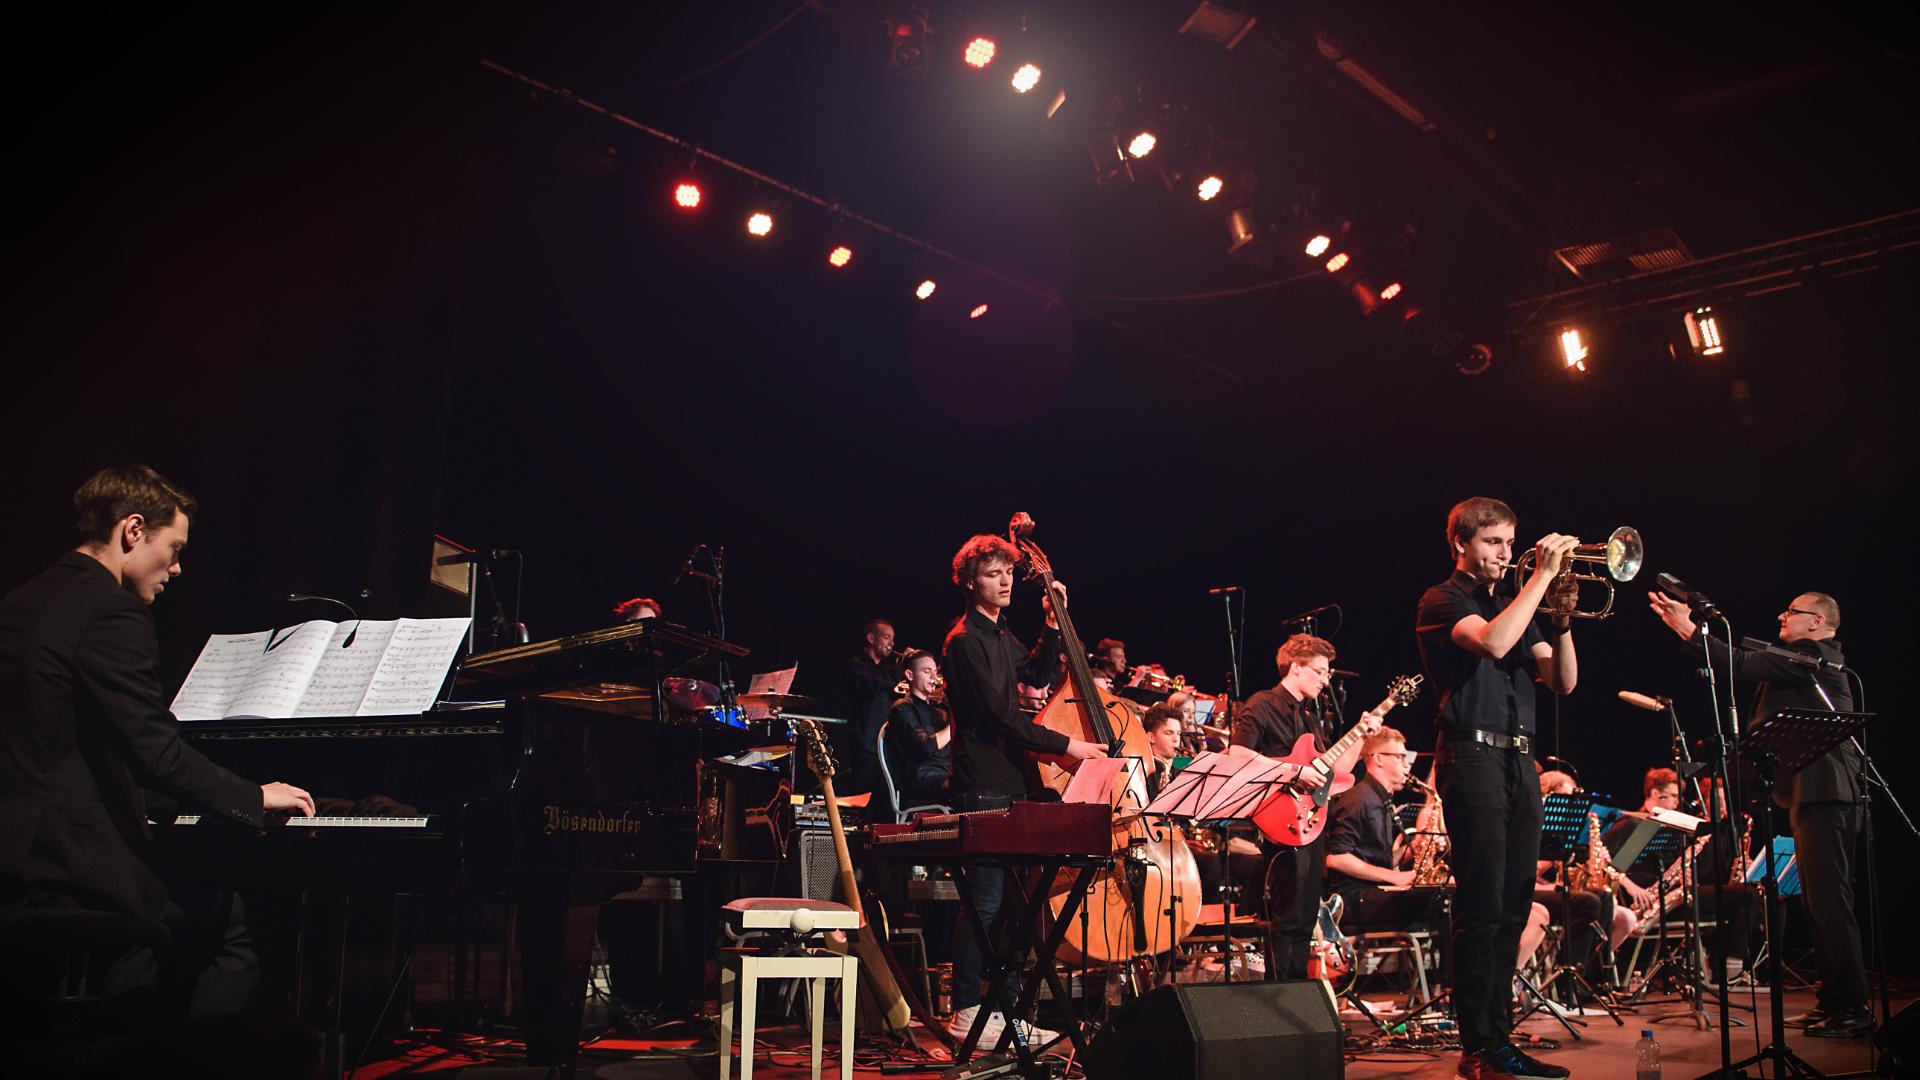 Jugend Jazz Orchester Bonn @ Pantheon Theater © Nadine Targiel 2018